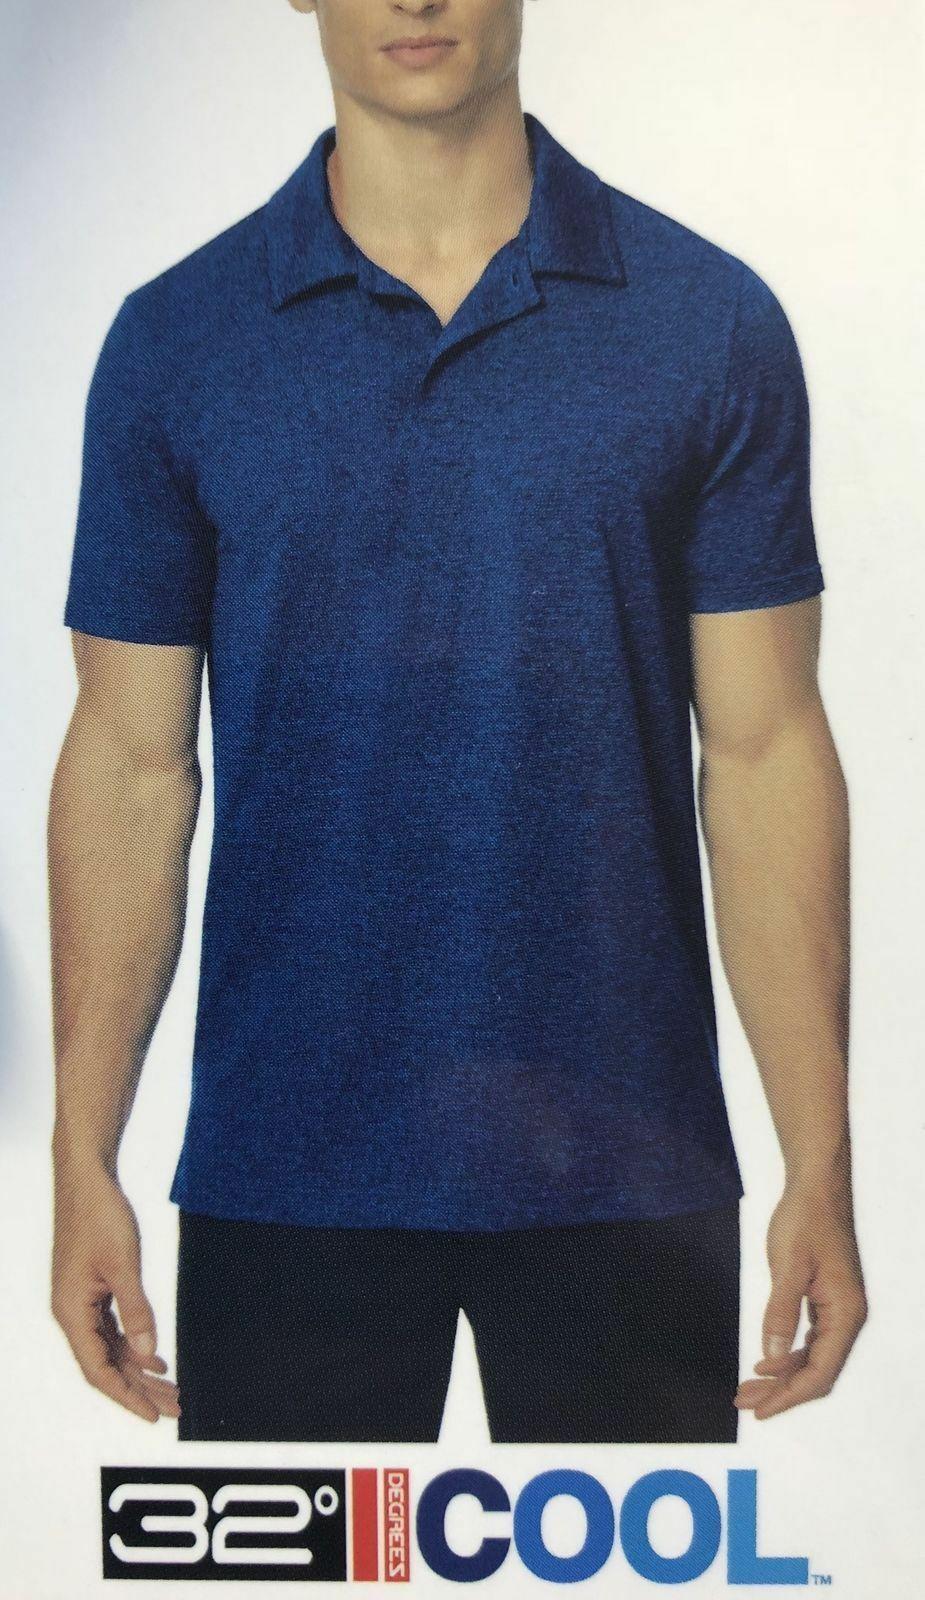 NEW 32 Degrees Men's Performance Polo, Ht. Lapis Blue